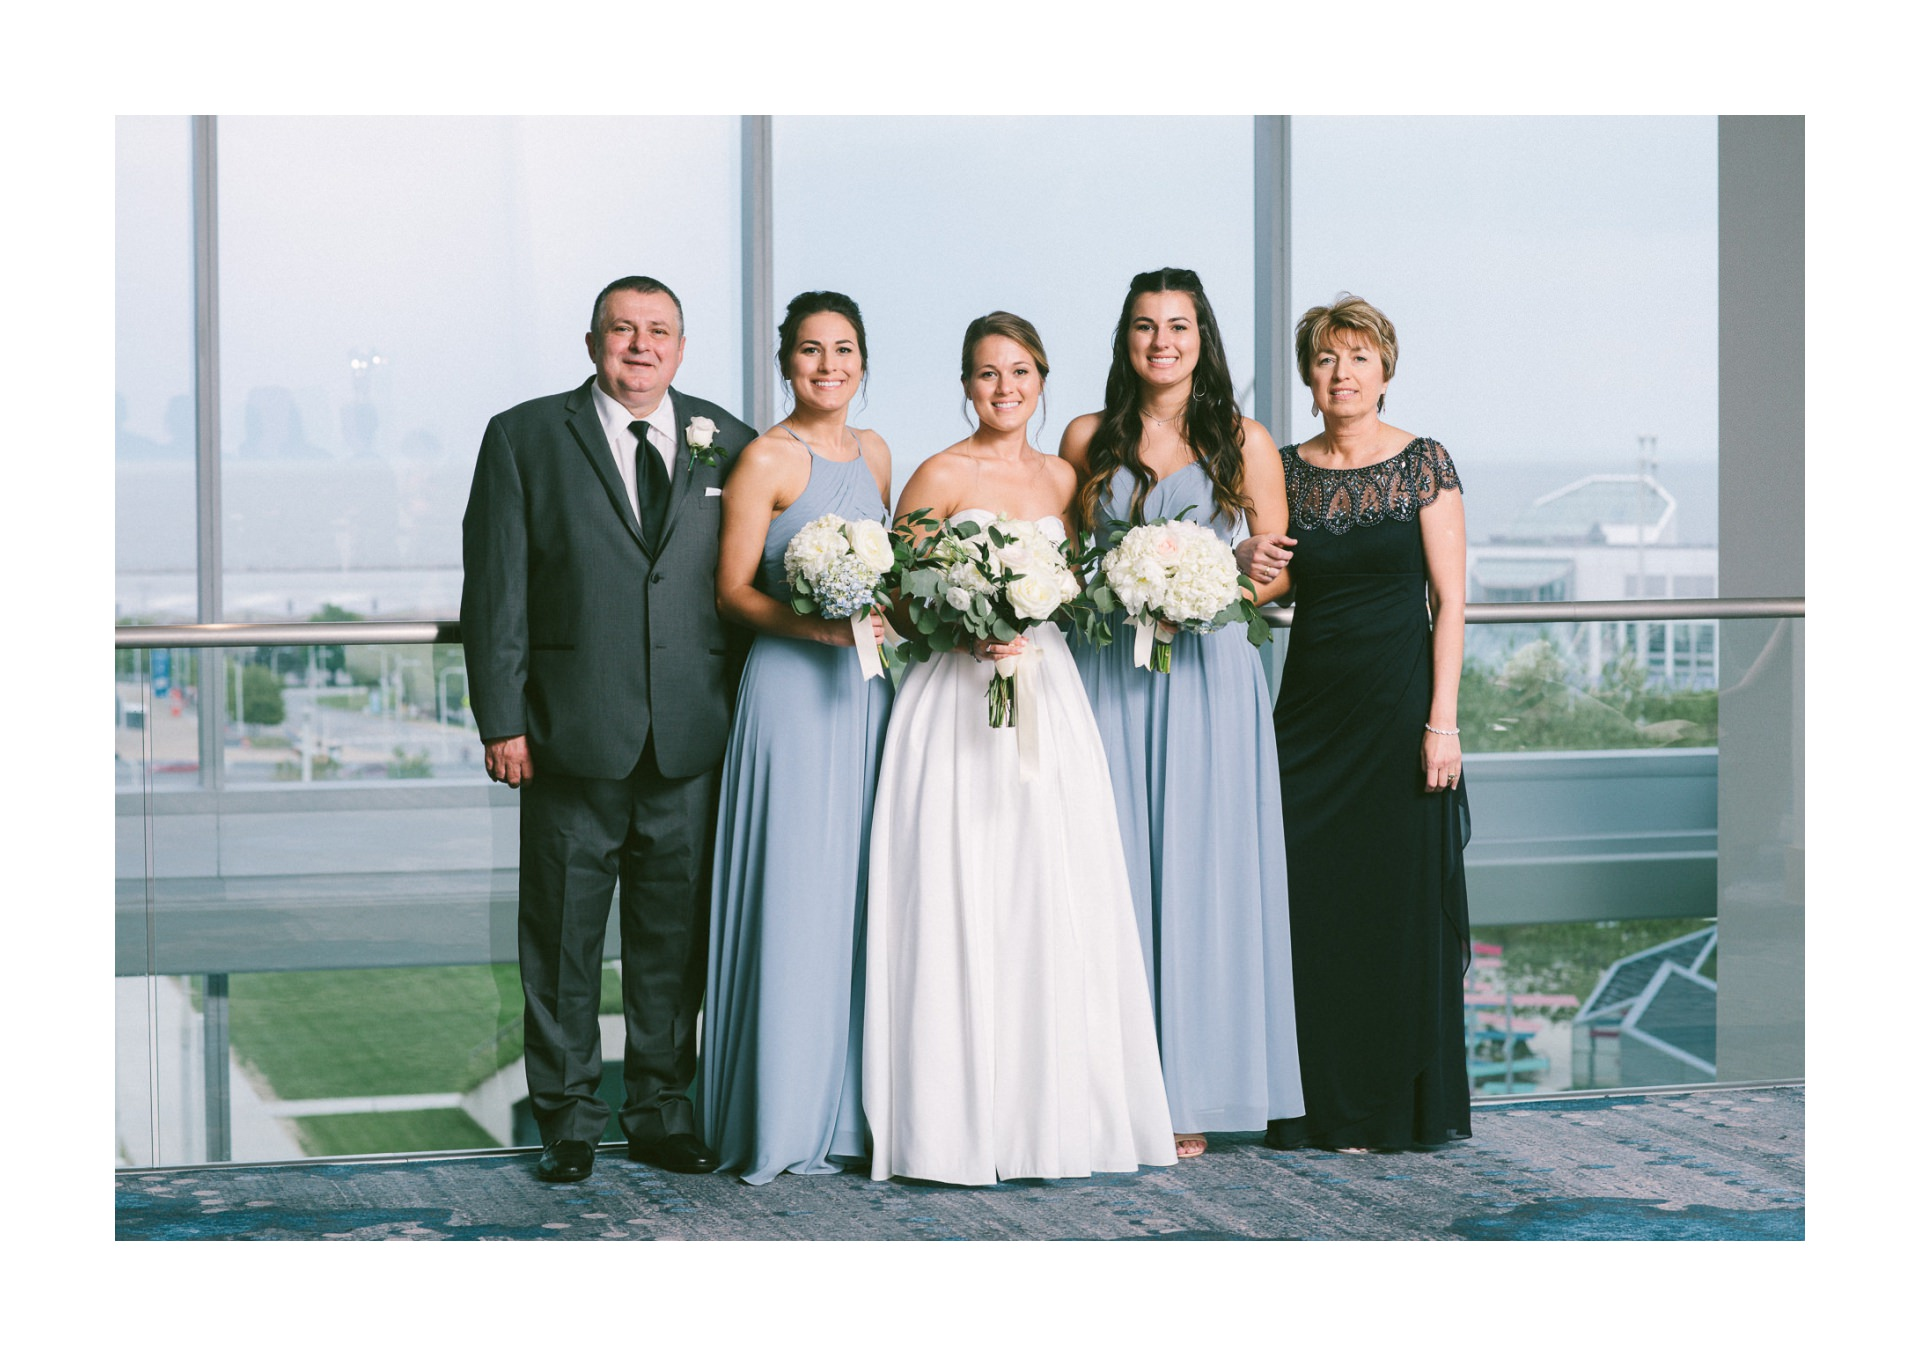 Dowtown Hilton Cleveland Wedding Photographer 2 3.jpg